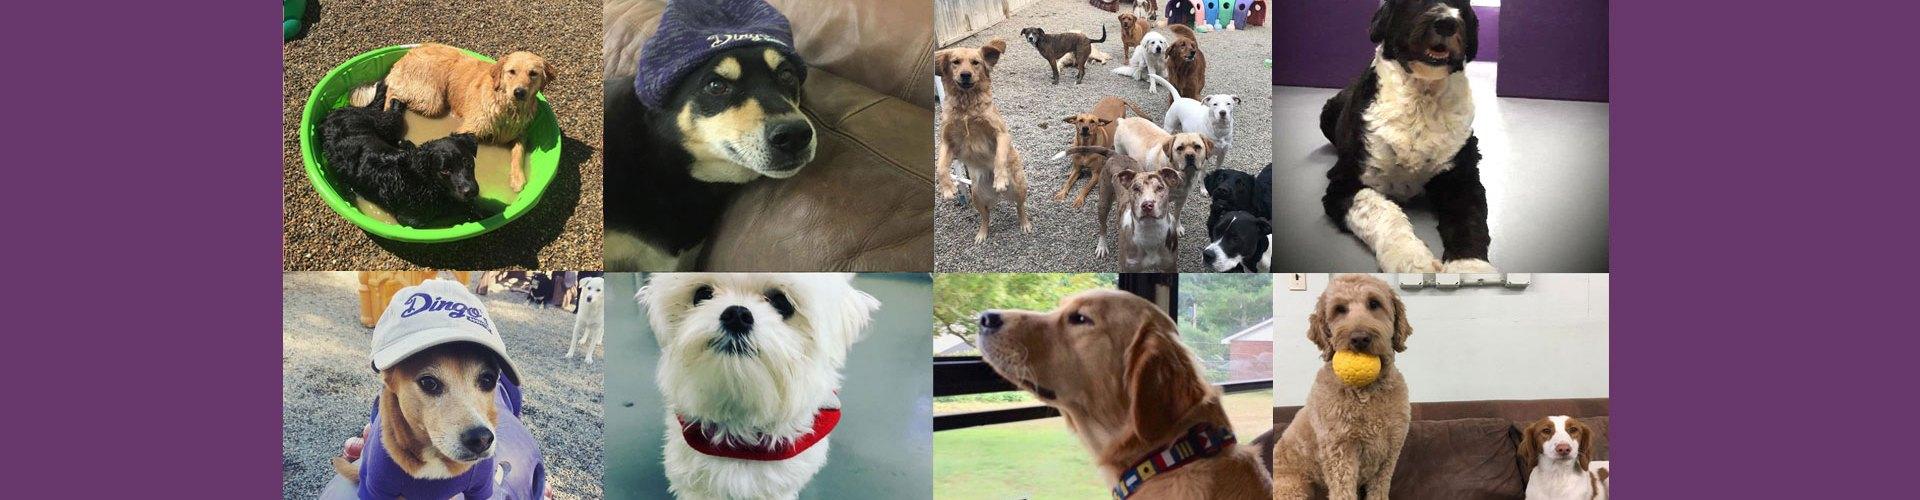 Dog Boarding | Beverly, MA | dingosdogsitting com